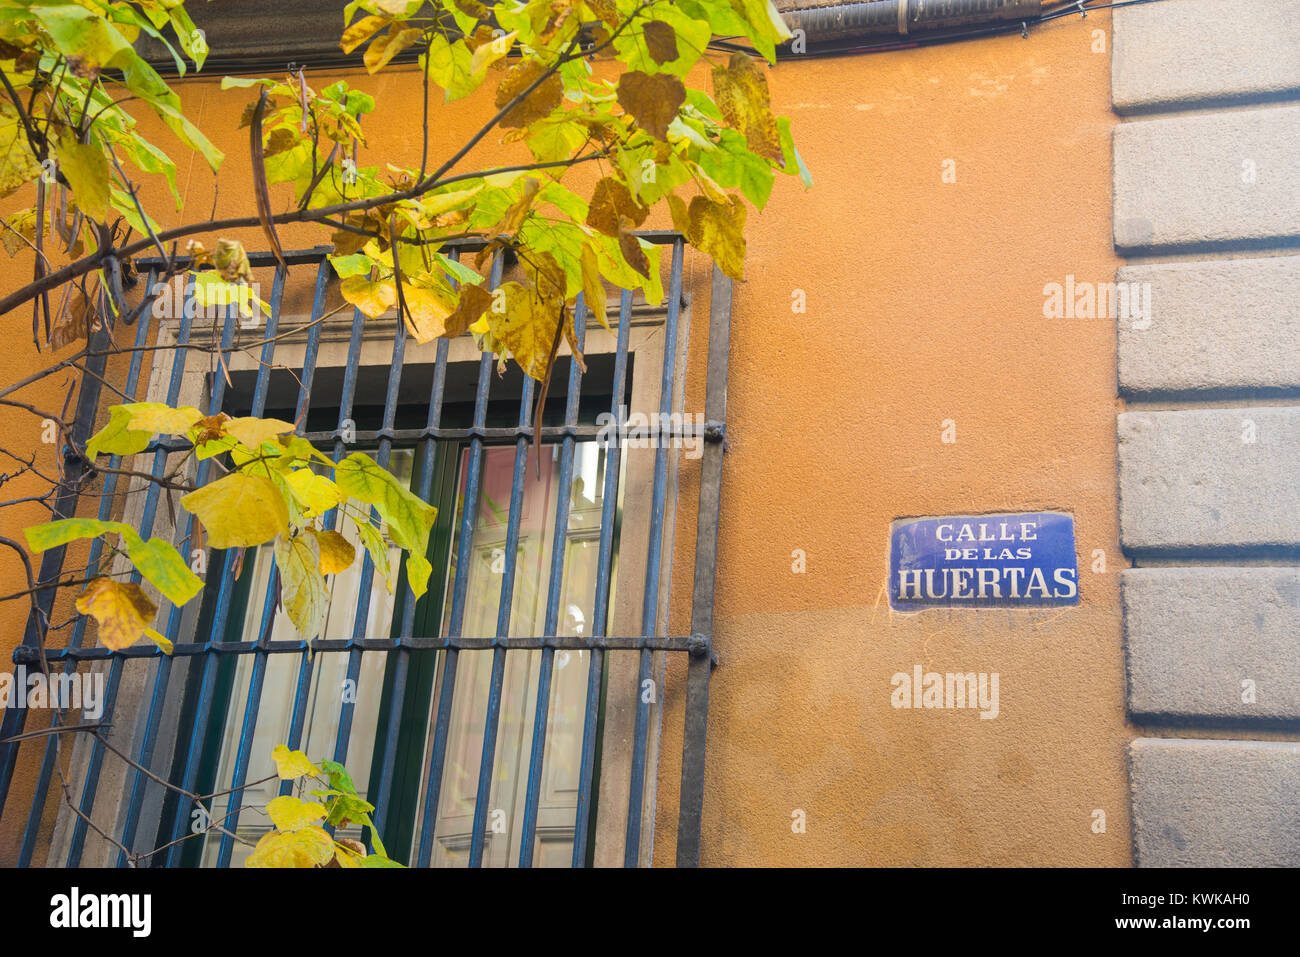 Calle de las Huertas. Madrid, Spain. - Stock Image